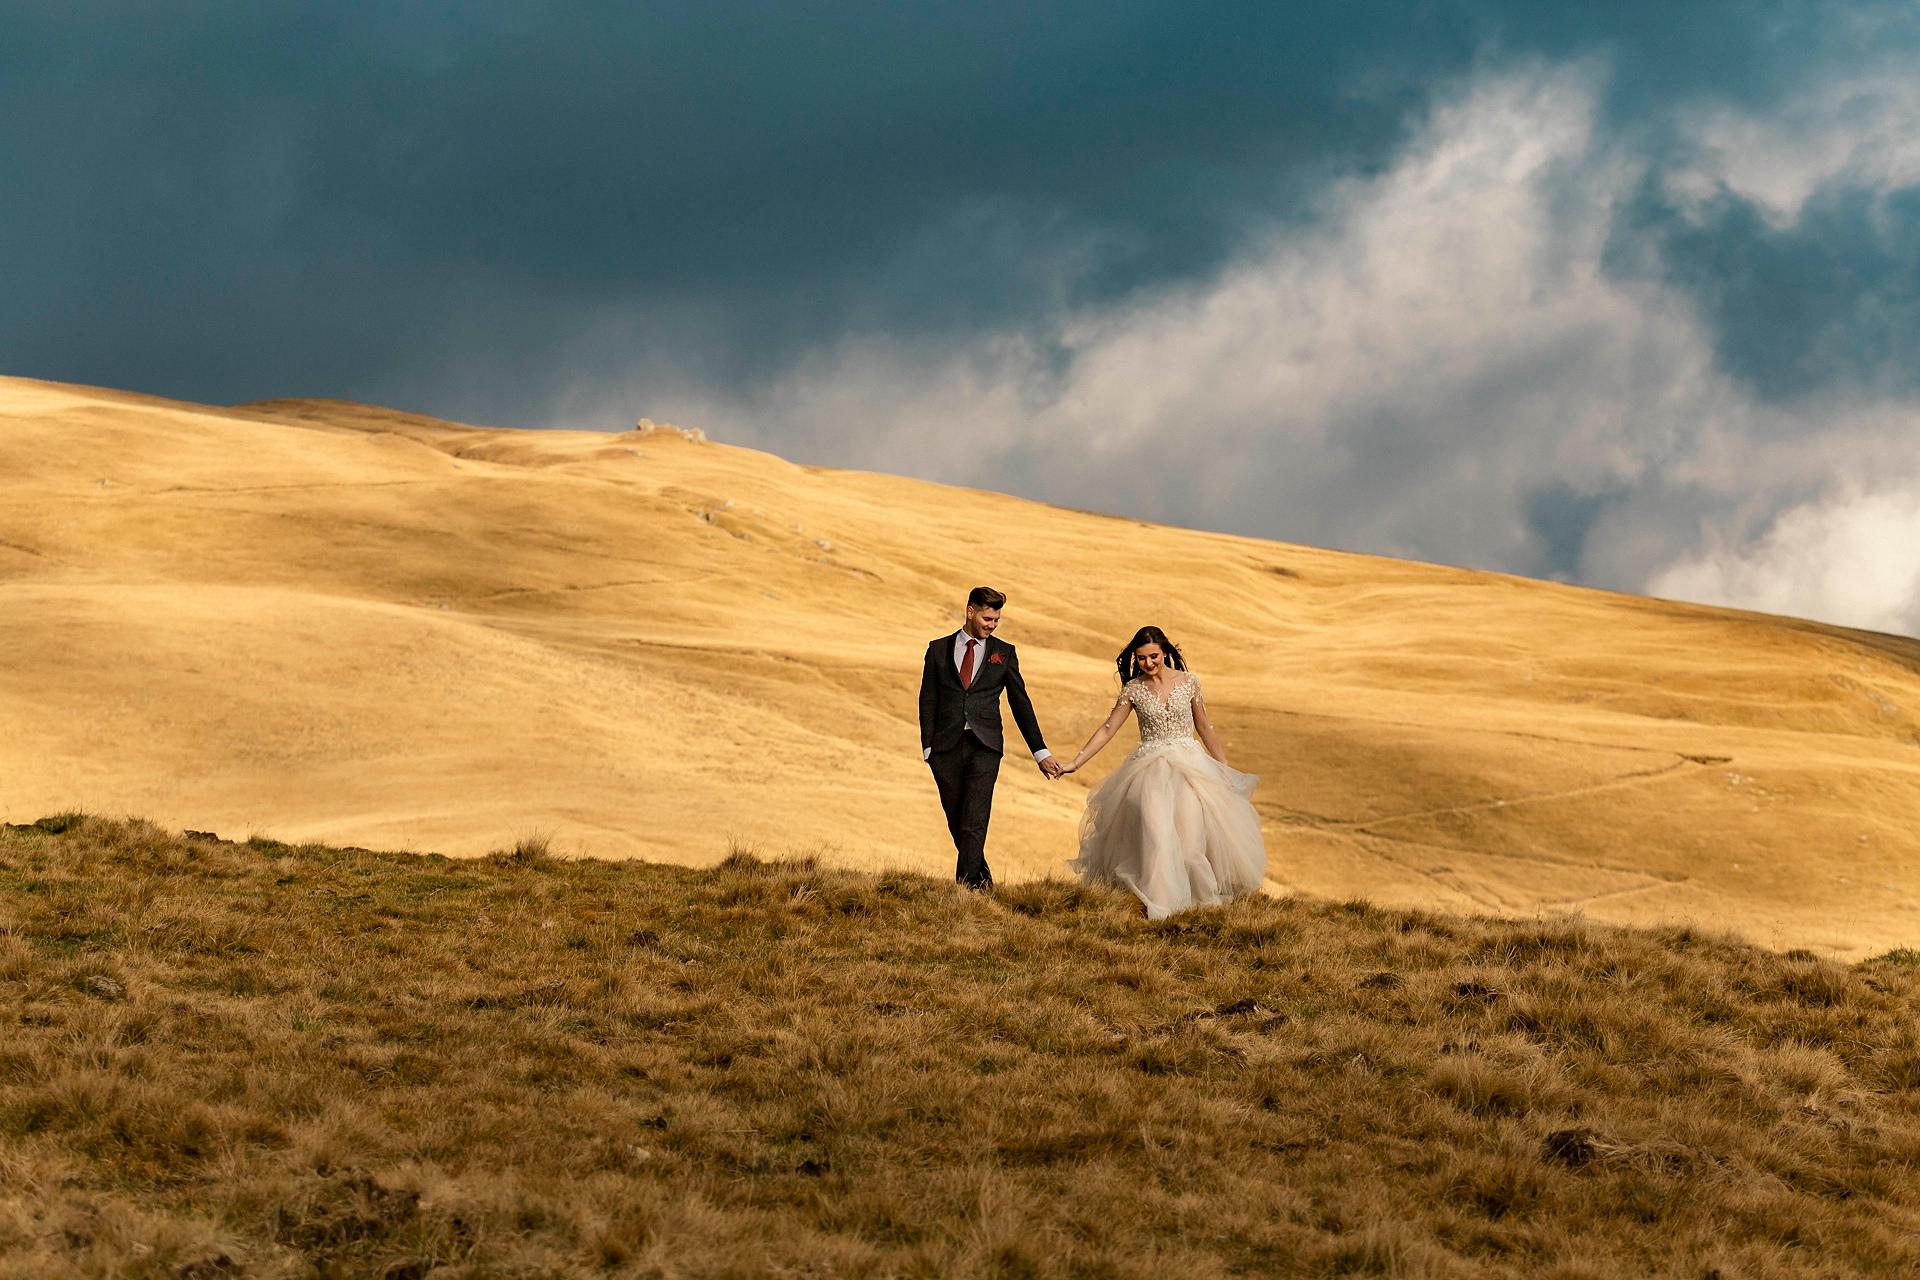 After-wedding-Bucegi-fotograf-nunta-sesivede-fotografie-001